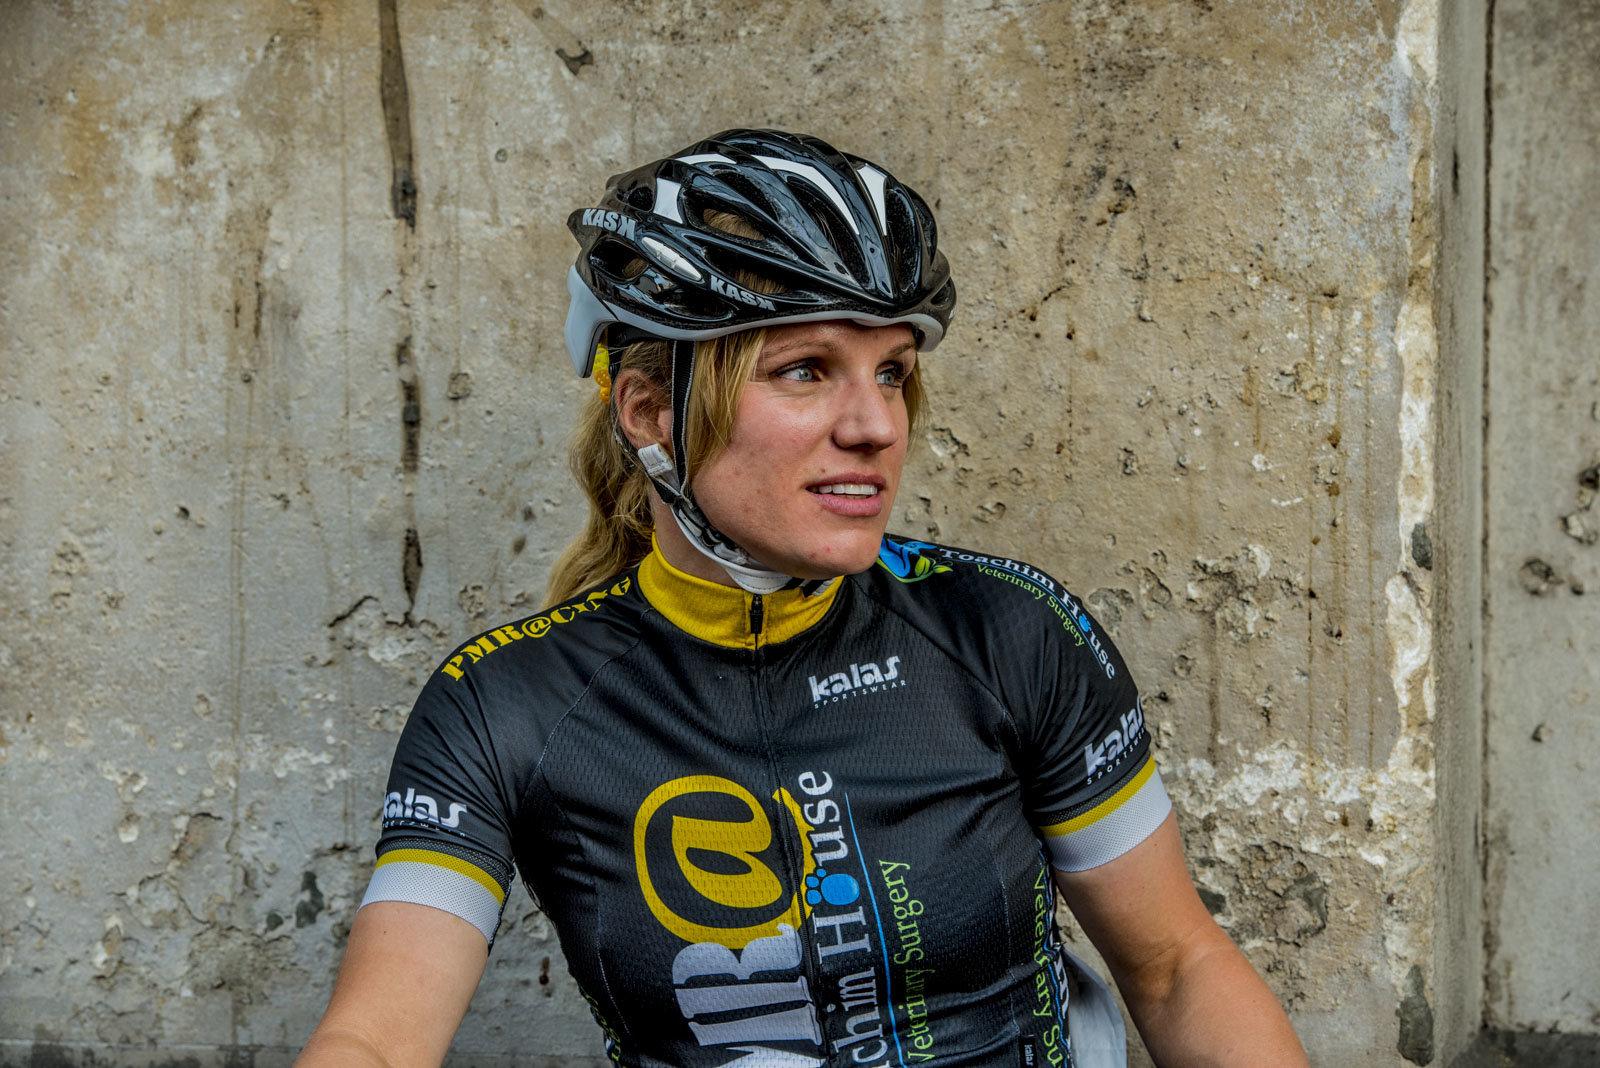 PMR Team rider